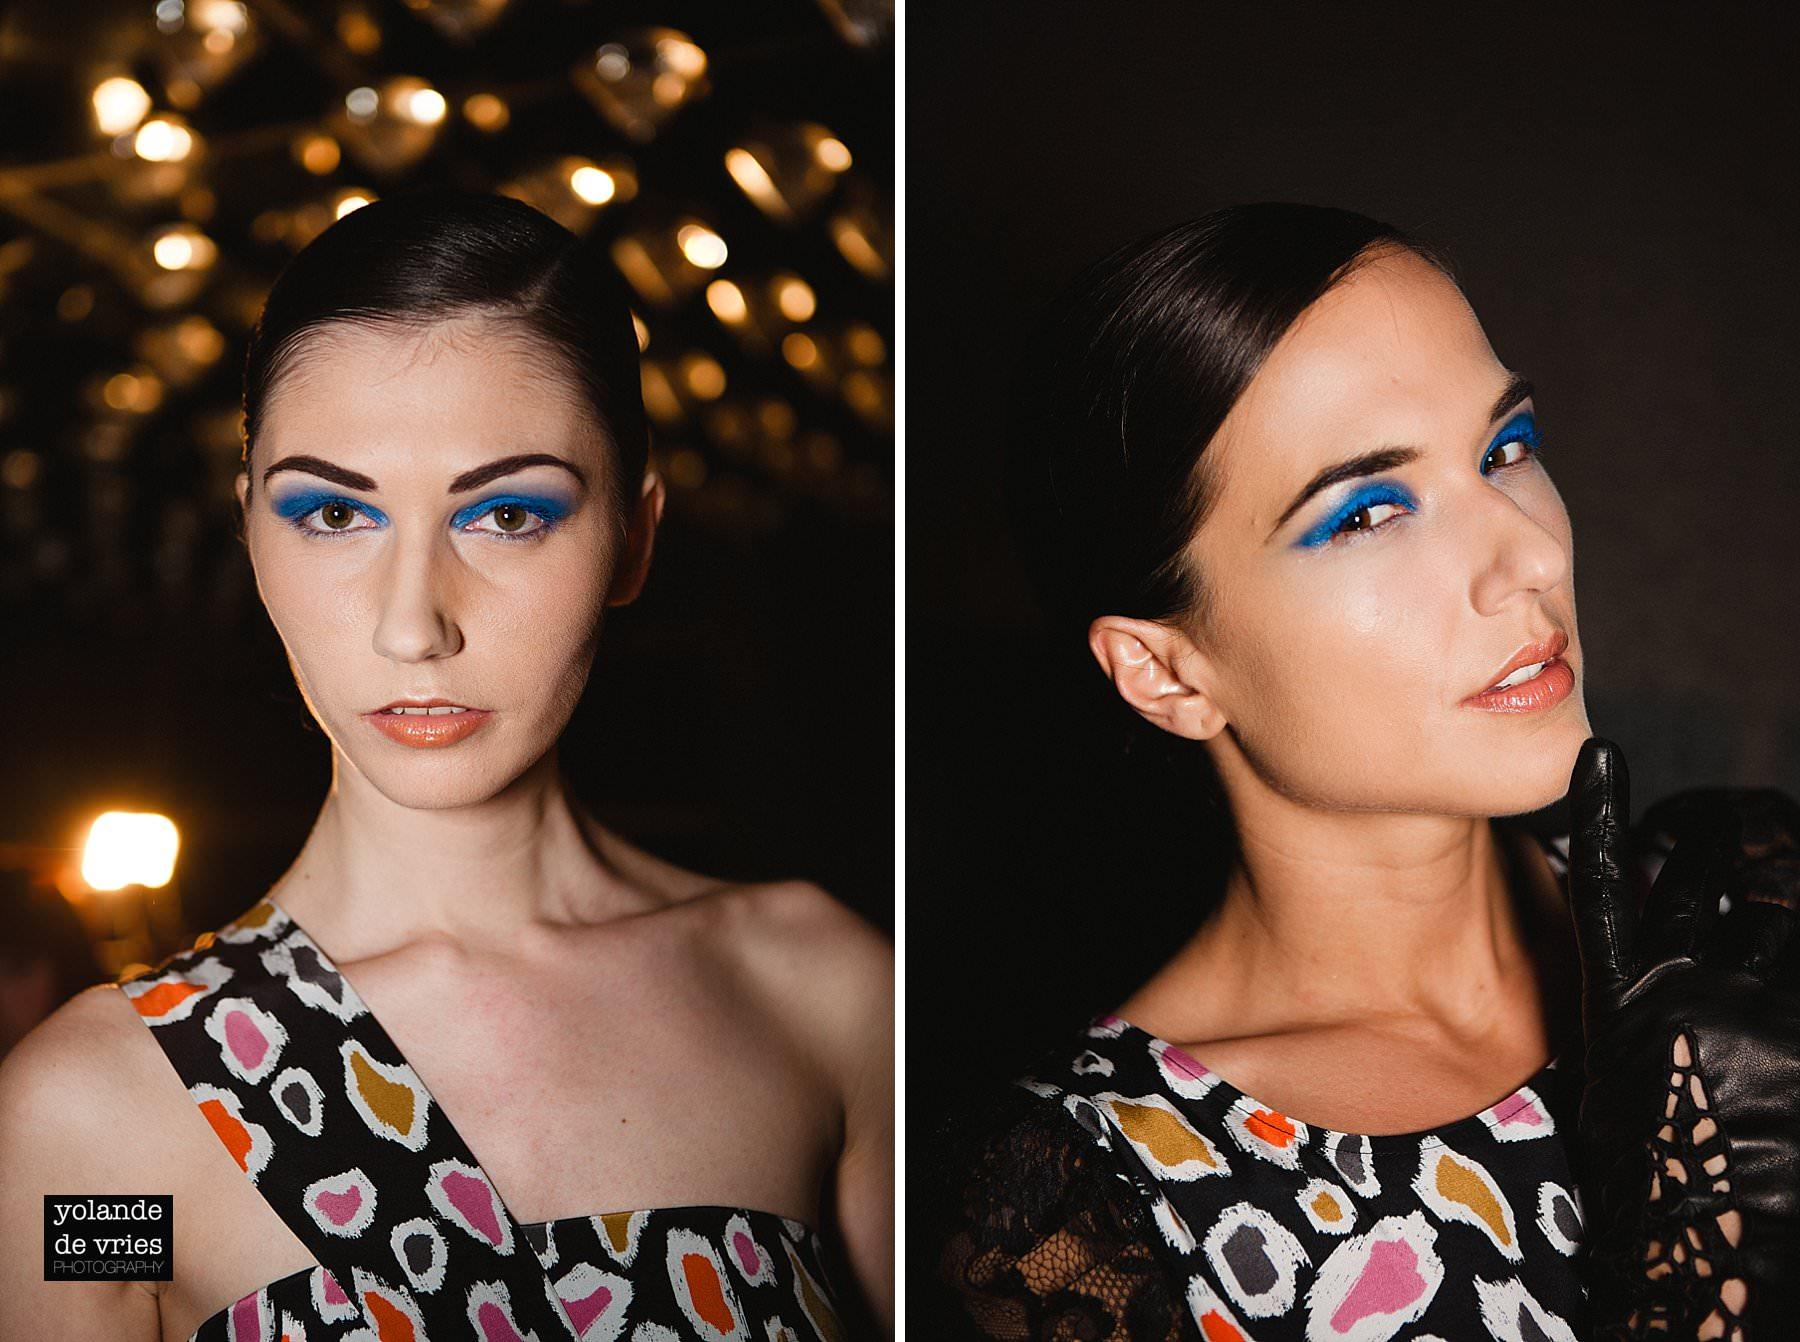 Olivia-Rubin-SS11-London-Fashion-Week-1669.jpg